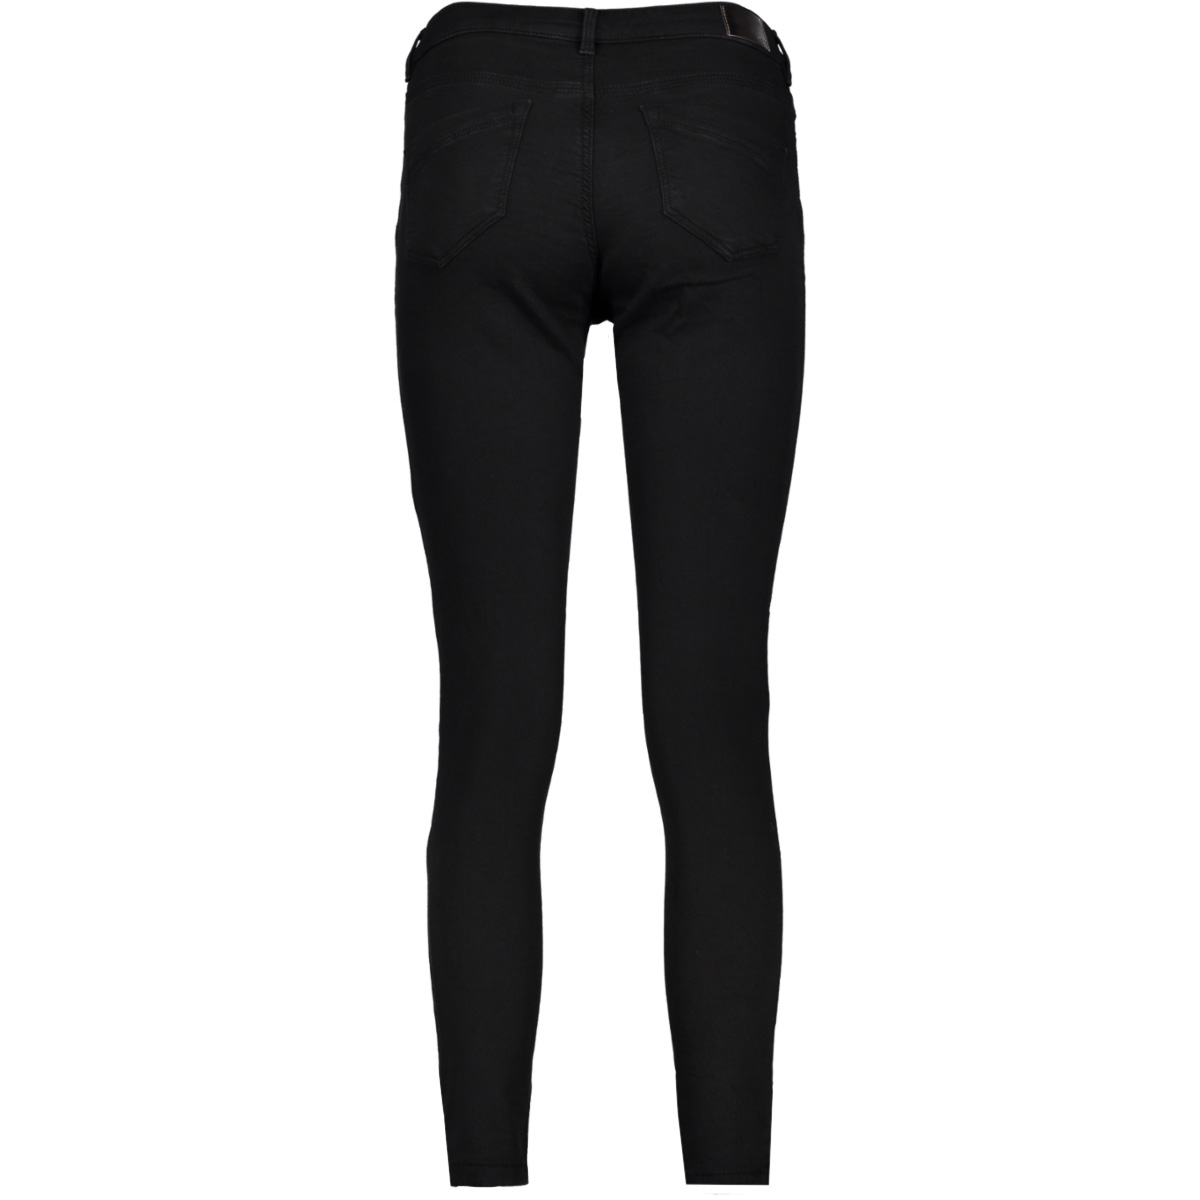 127cc1b022 edc jeans c001